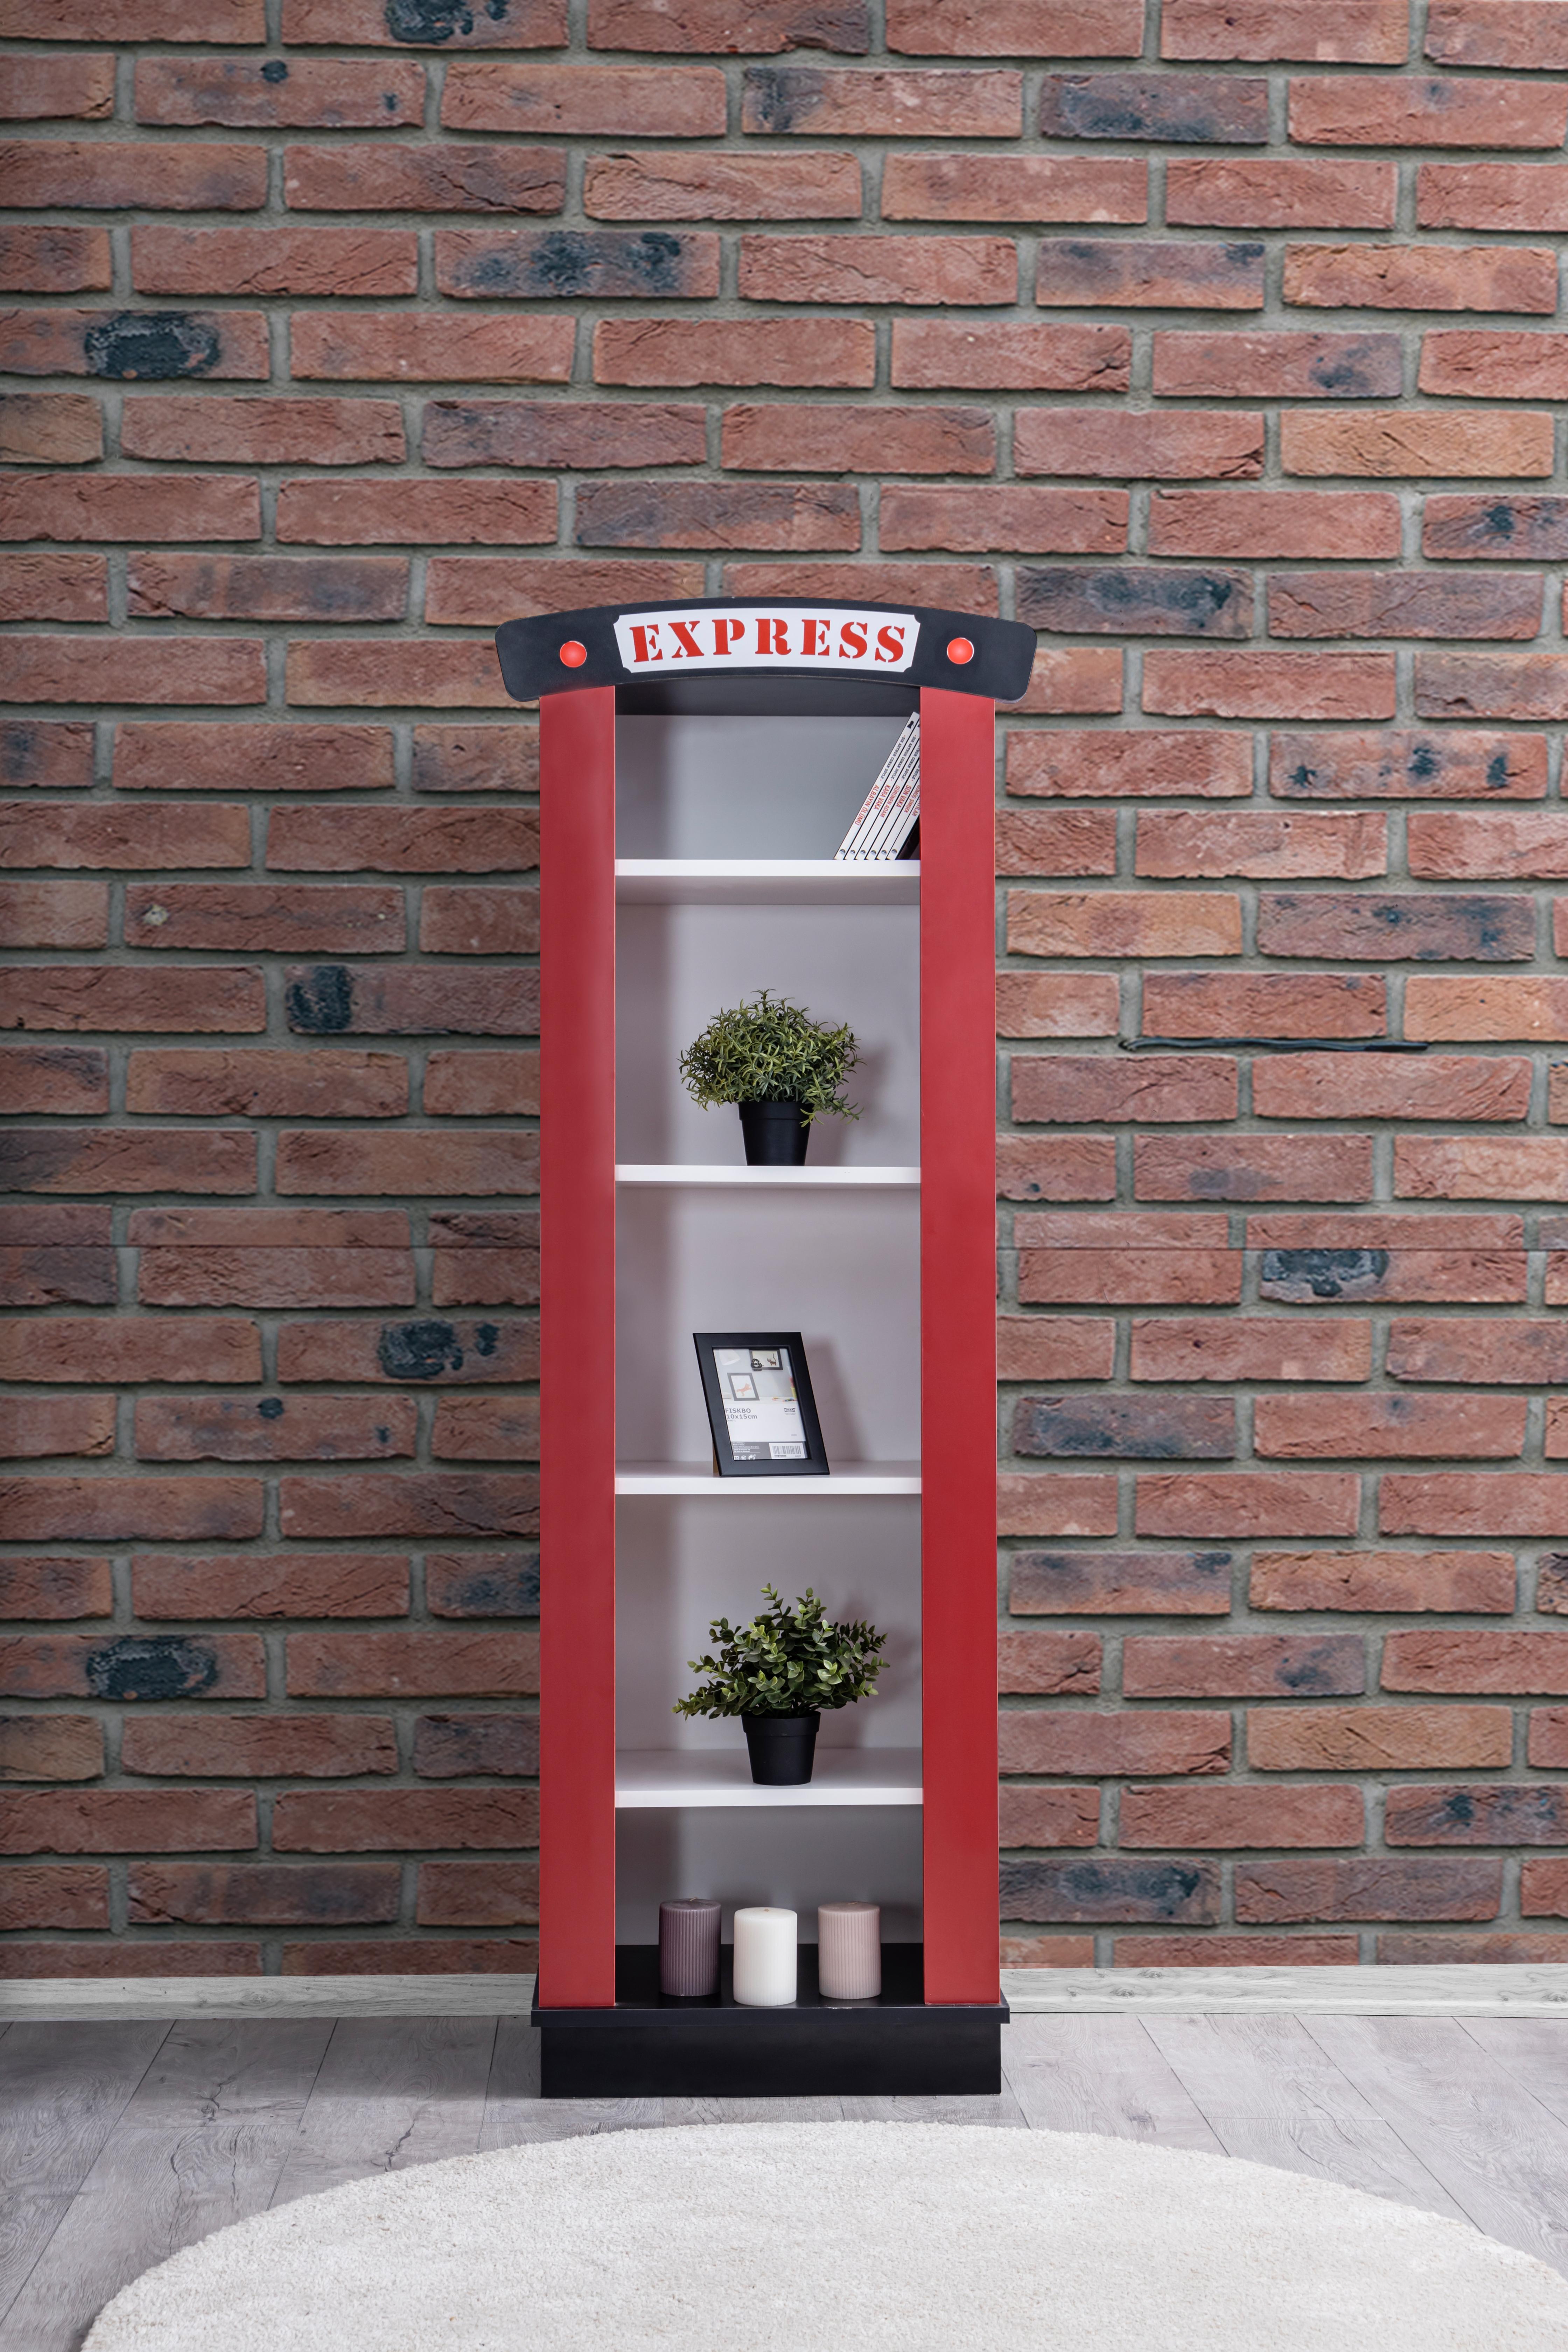 Odacix Kinderzimmer Bücherregal Express in Rot & Schwarz